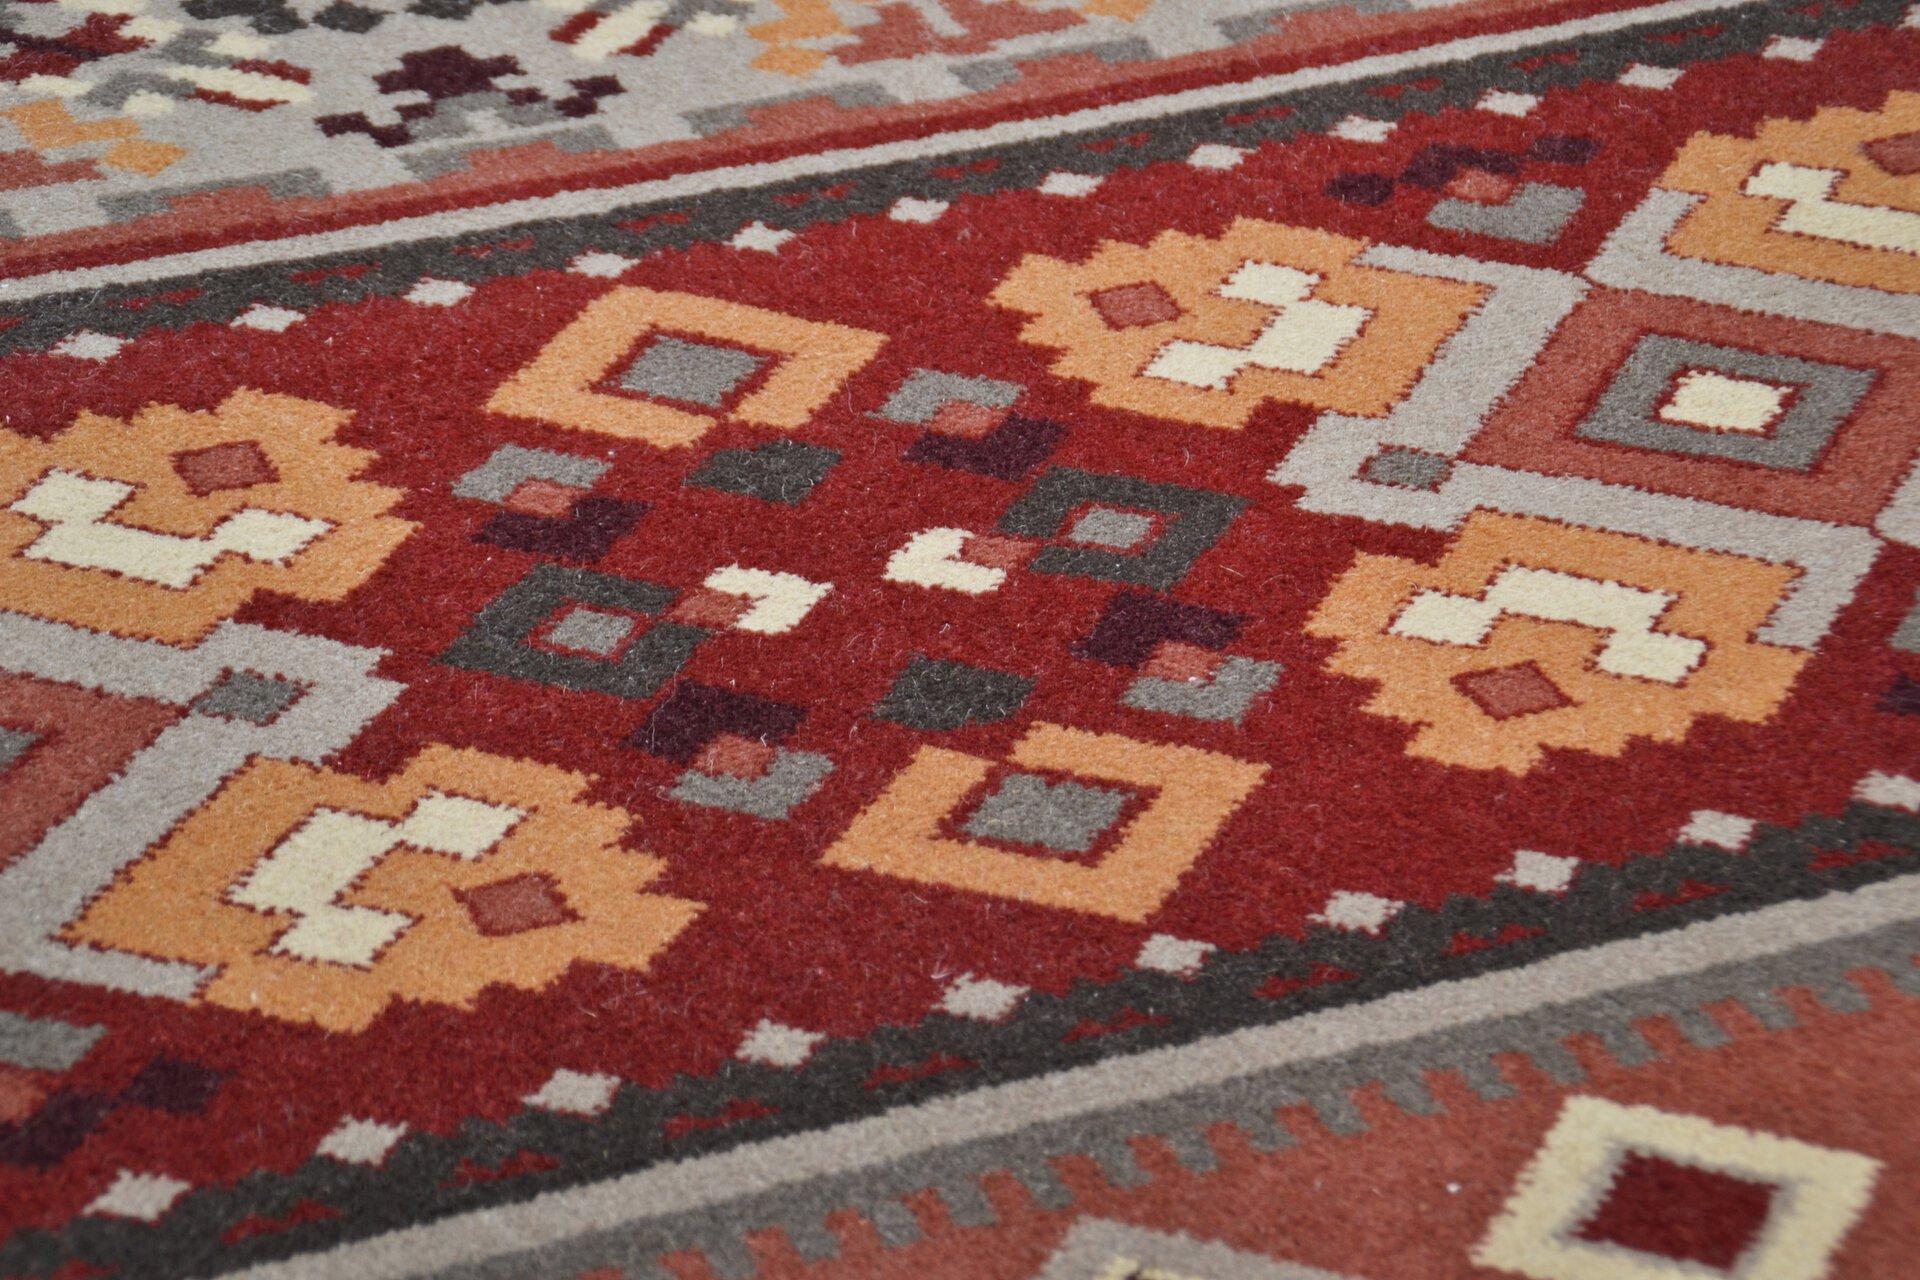 Maschinenwebteppich Timeless Theko Textil orange 1 x 2 cm